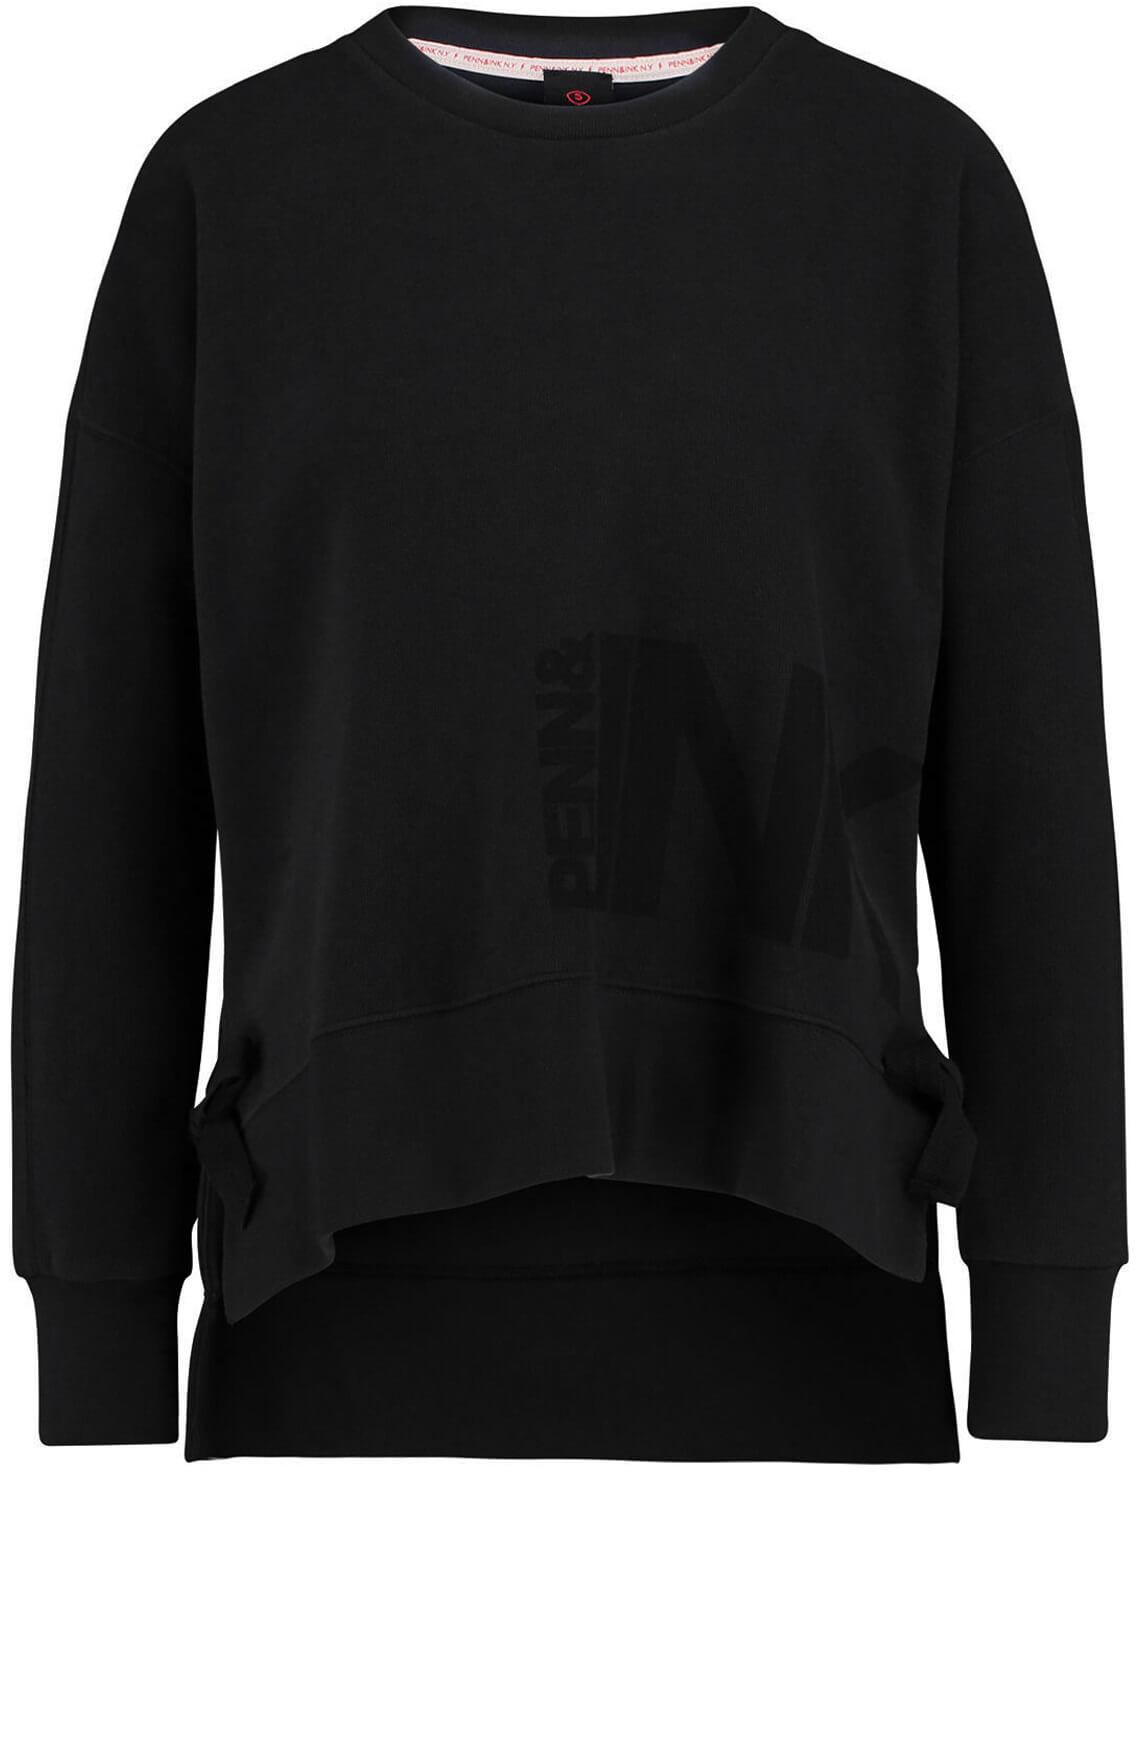 Penn & Ink Dames Sweater met strikdetail zwart